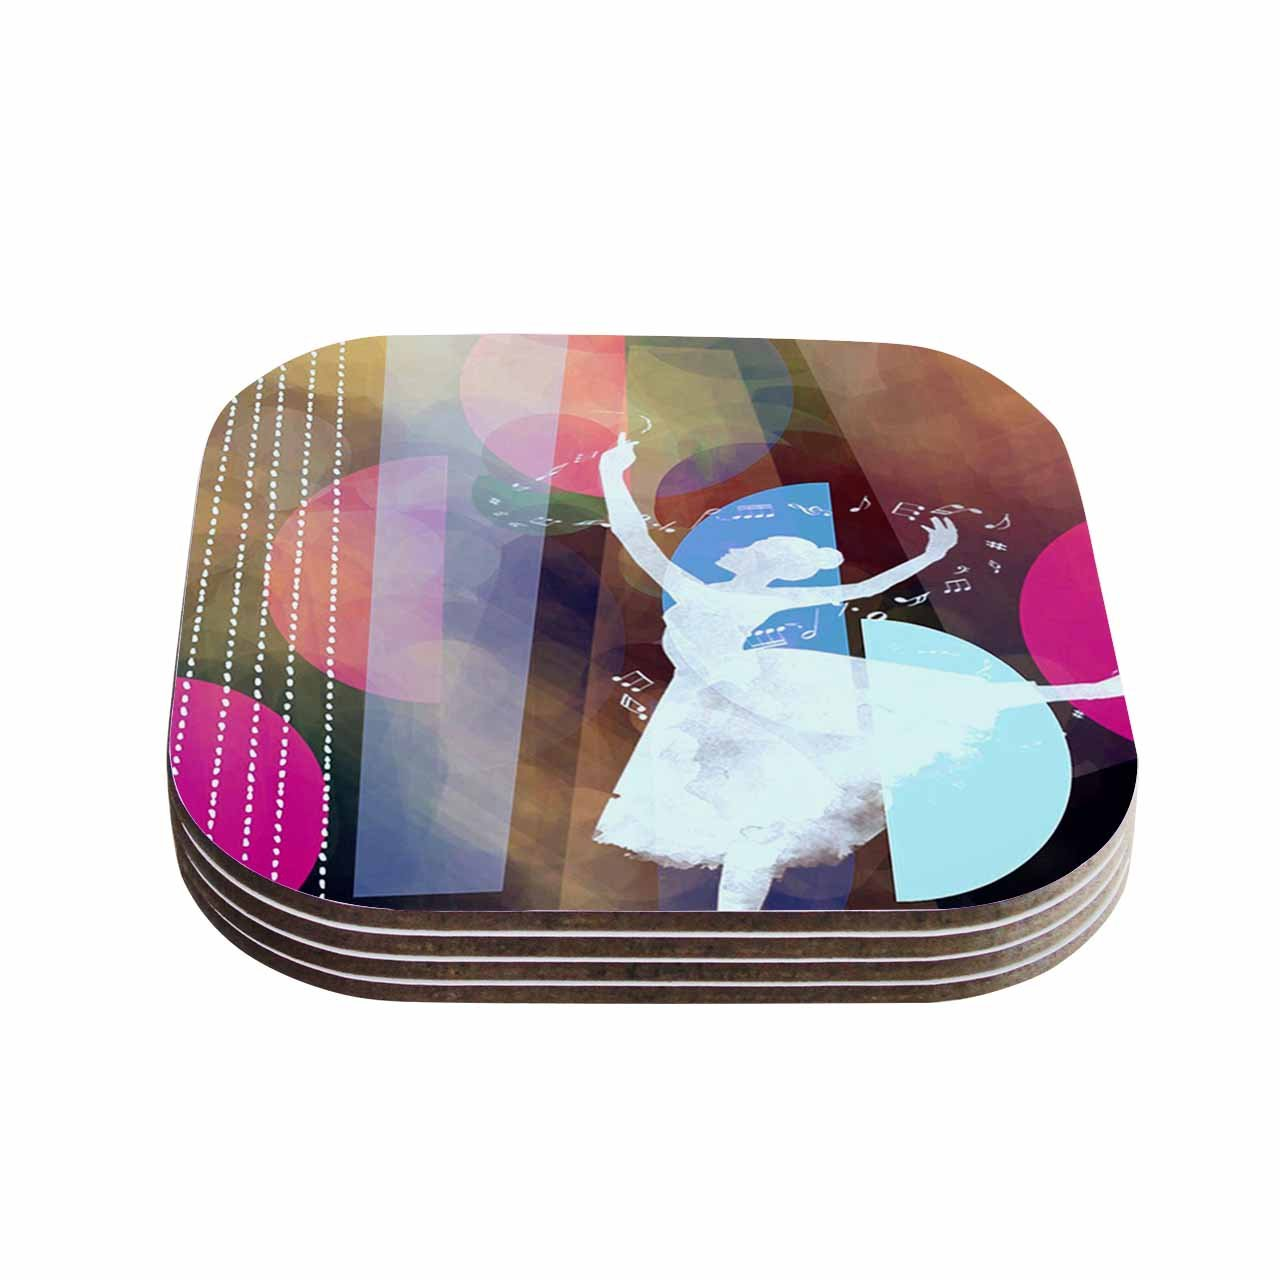 Set of 4 KESS InHouse AlyZen MoonshadowPINK BALLET Geometric Coasters 4 x 4 Multicolor